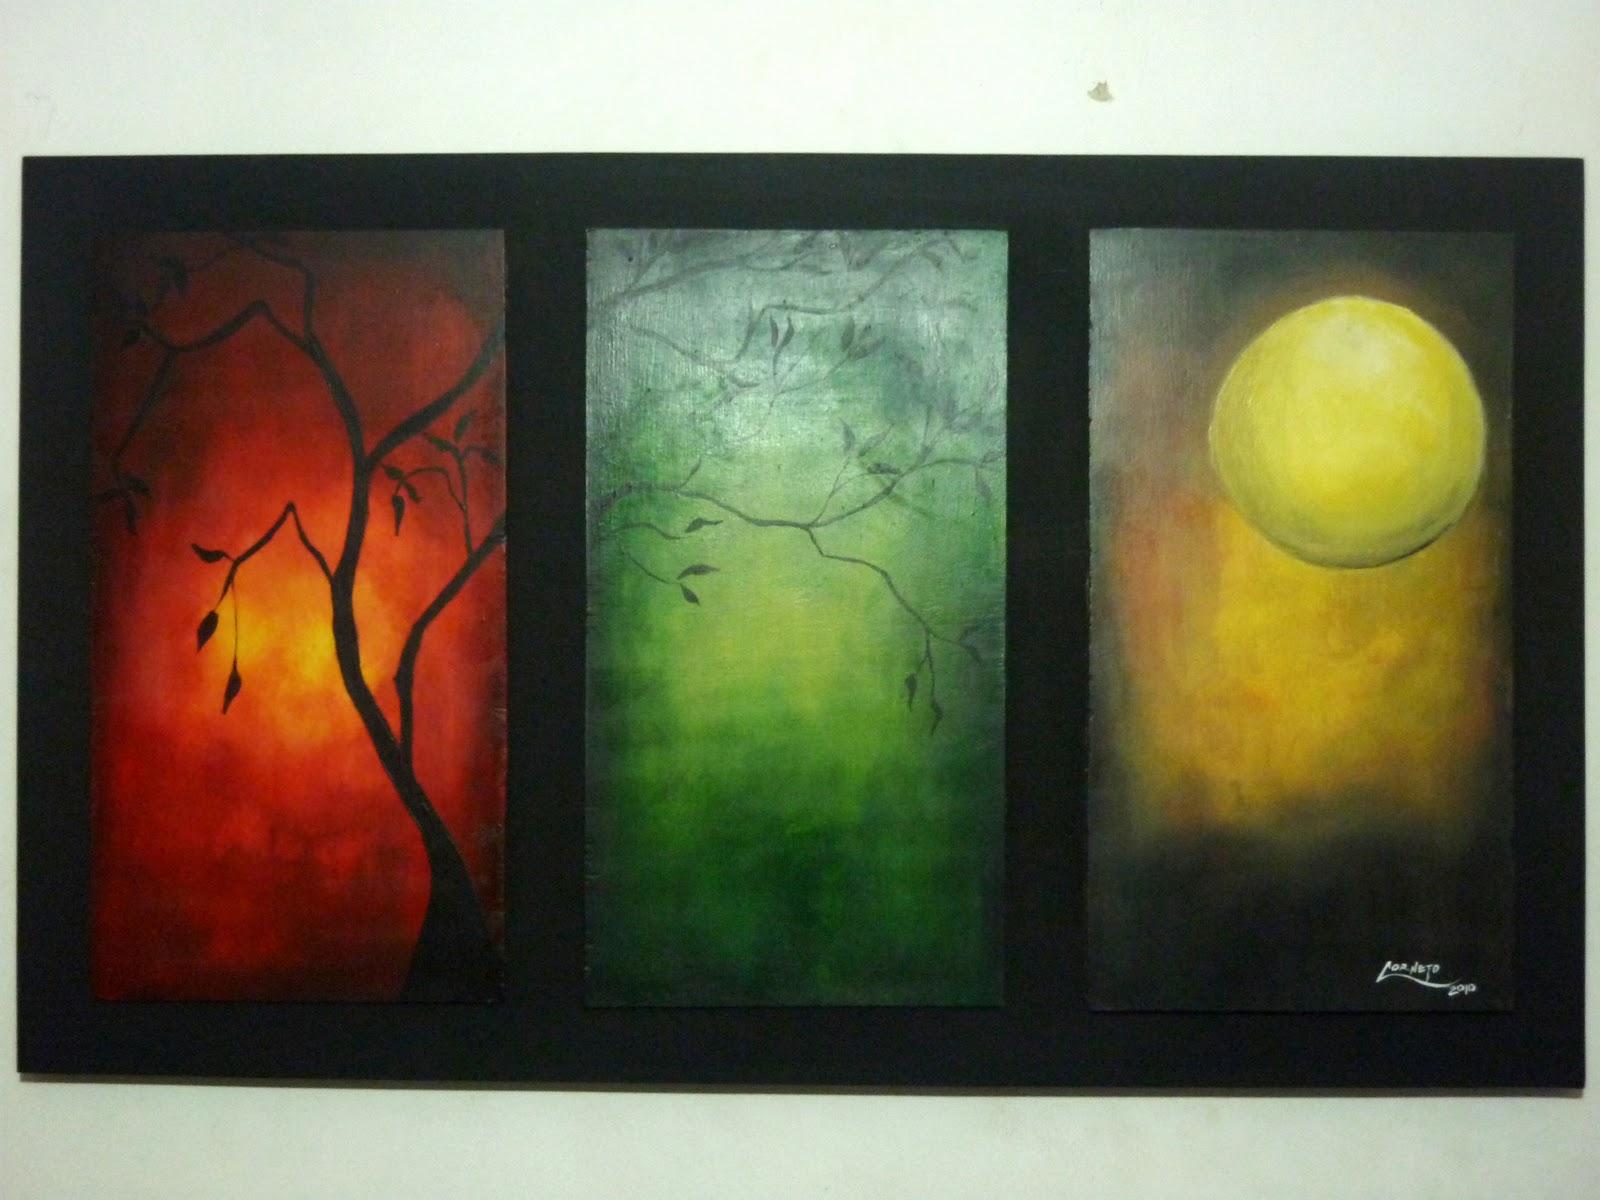 Decorarte pinturas - Decorarte pinturas ...